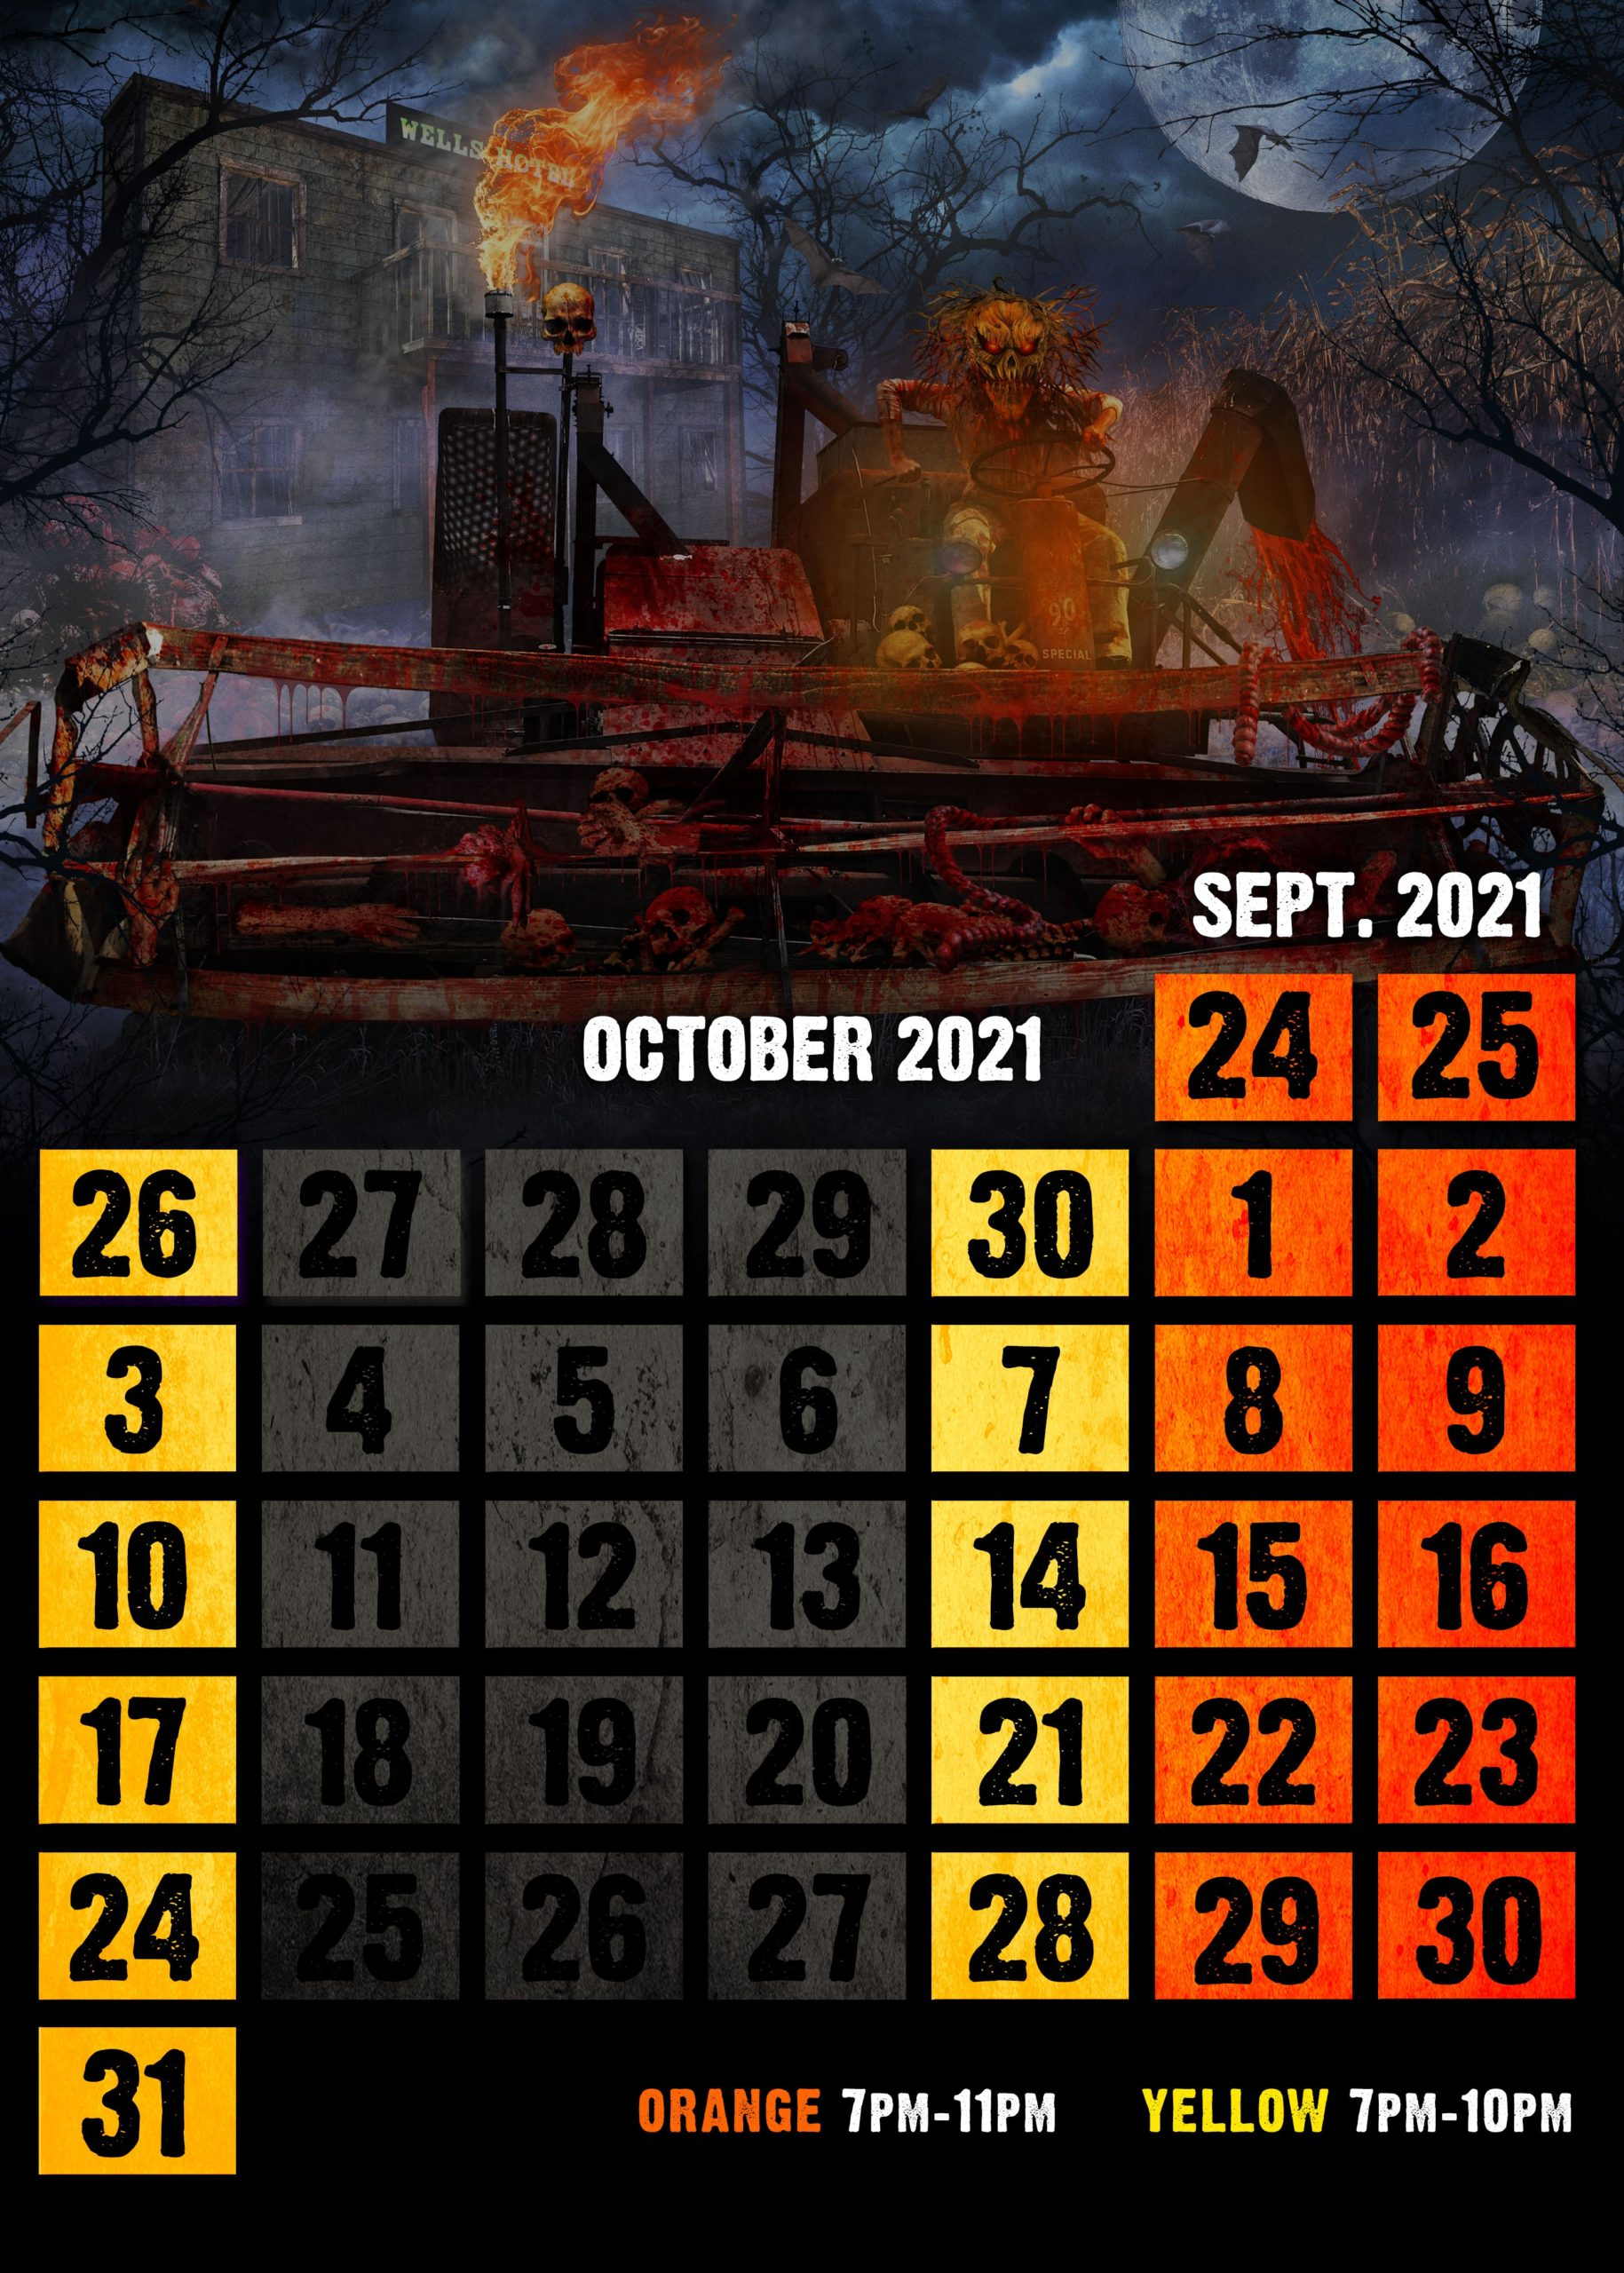 2021 terror calendar